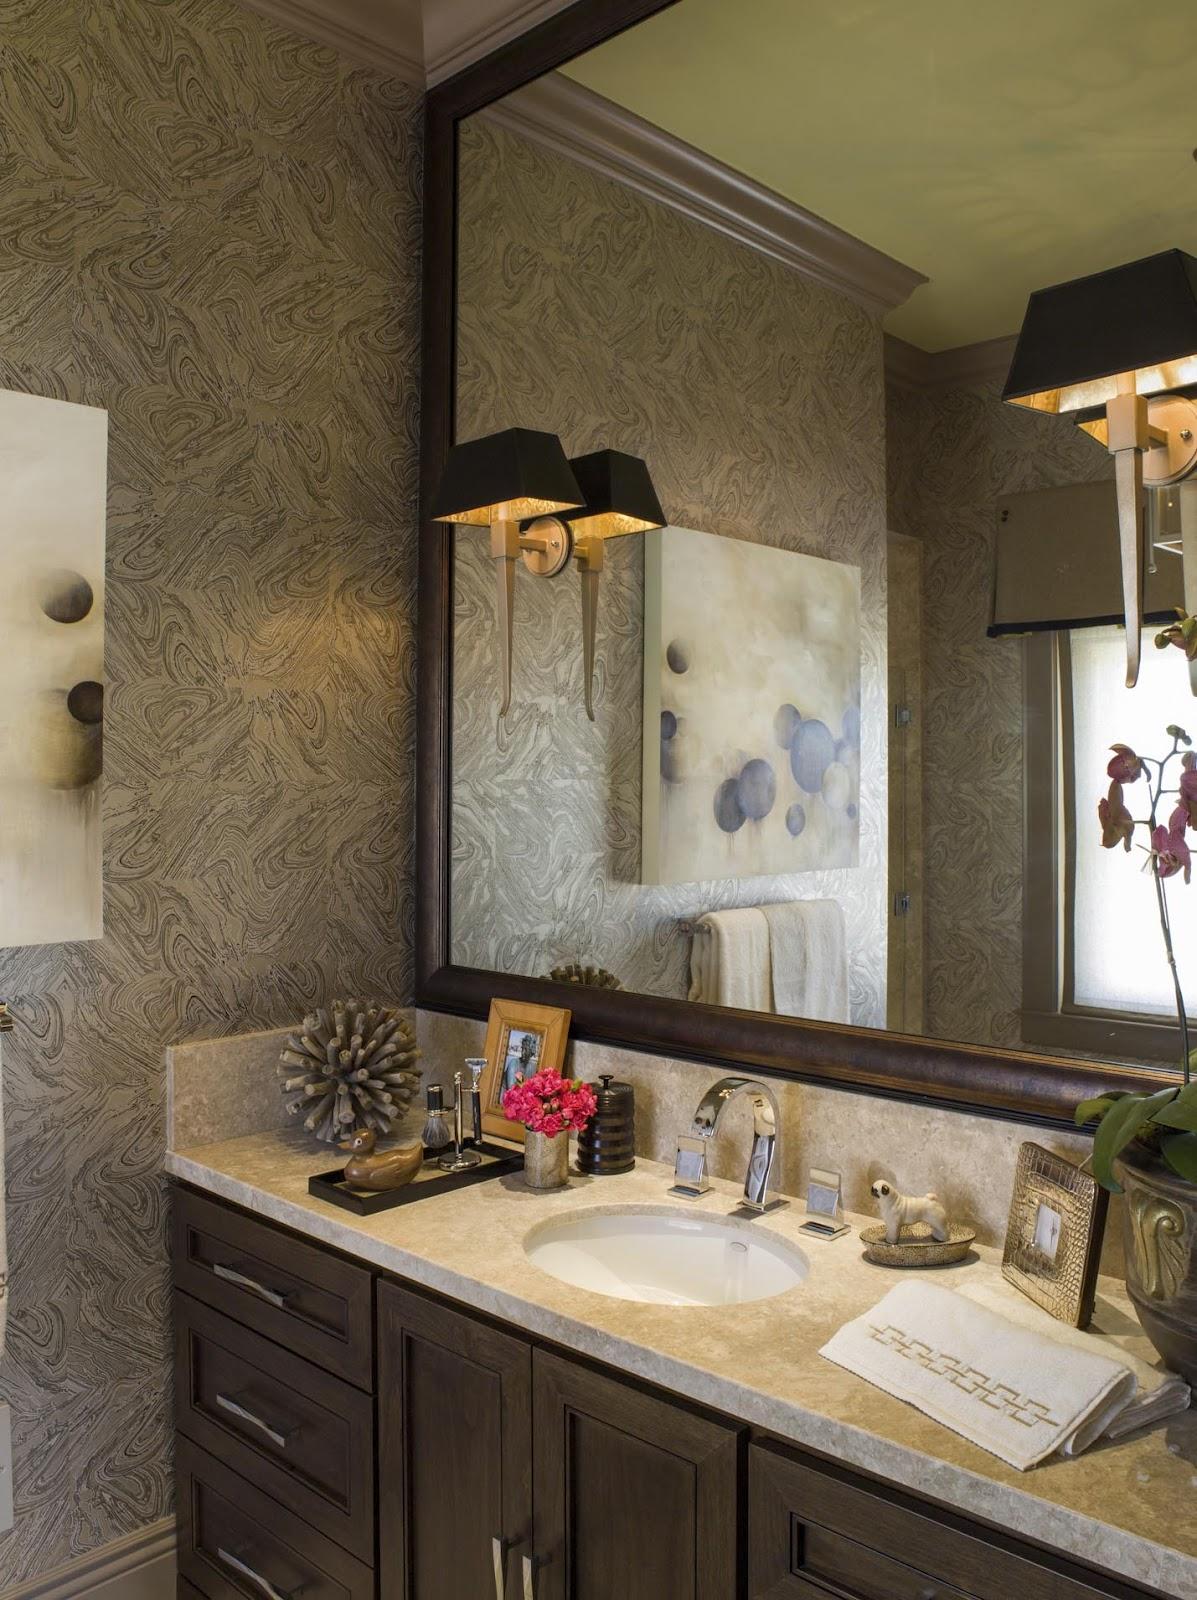 Bathroom Wallpaper Ideas Bathroom Wallpaper Designs 1197x1600